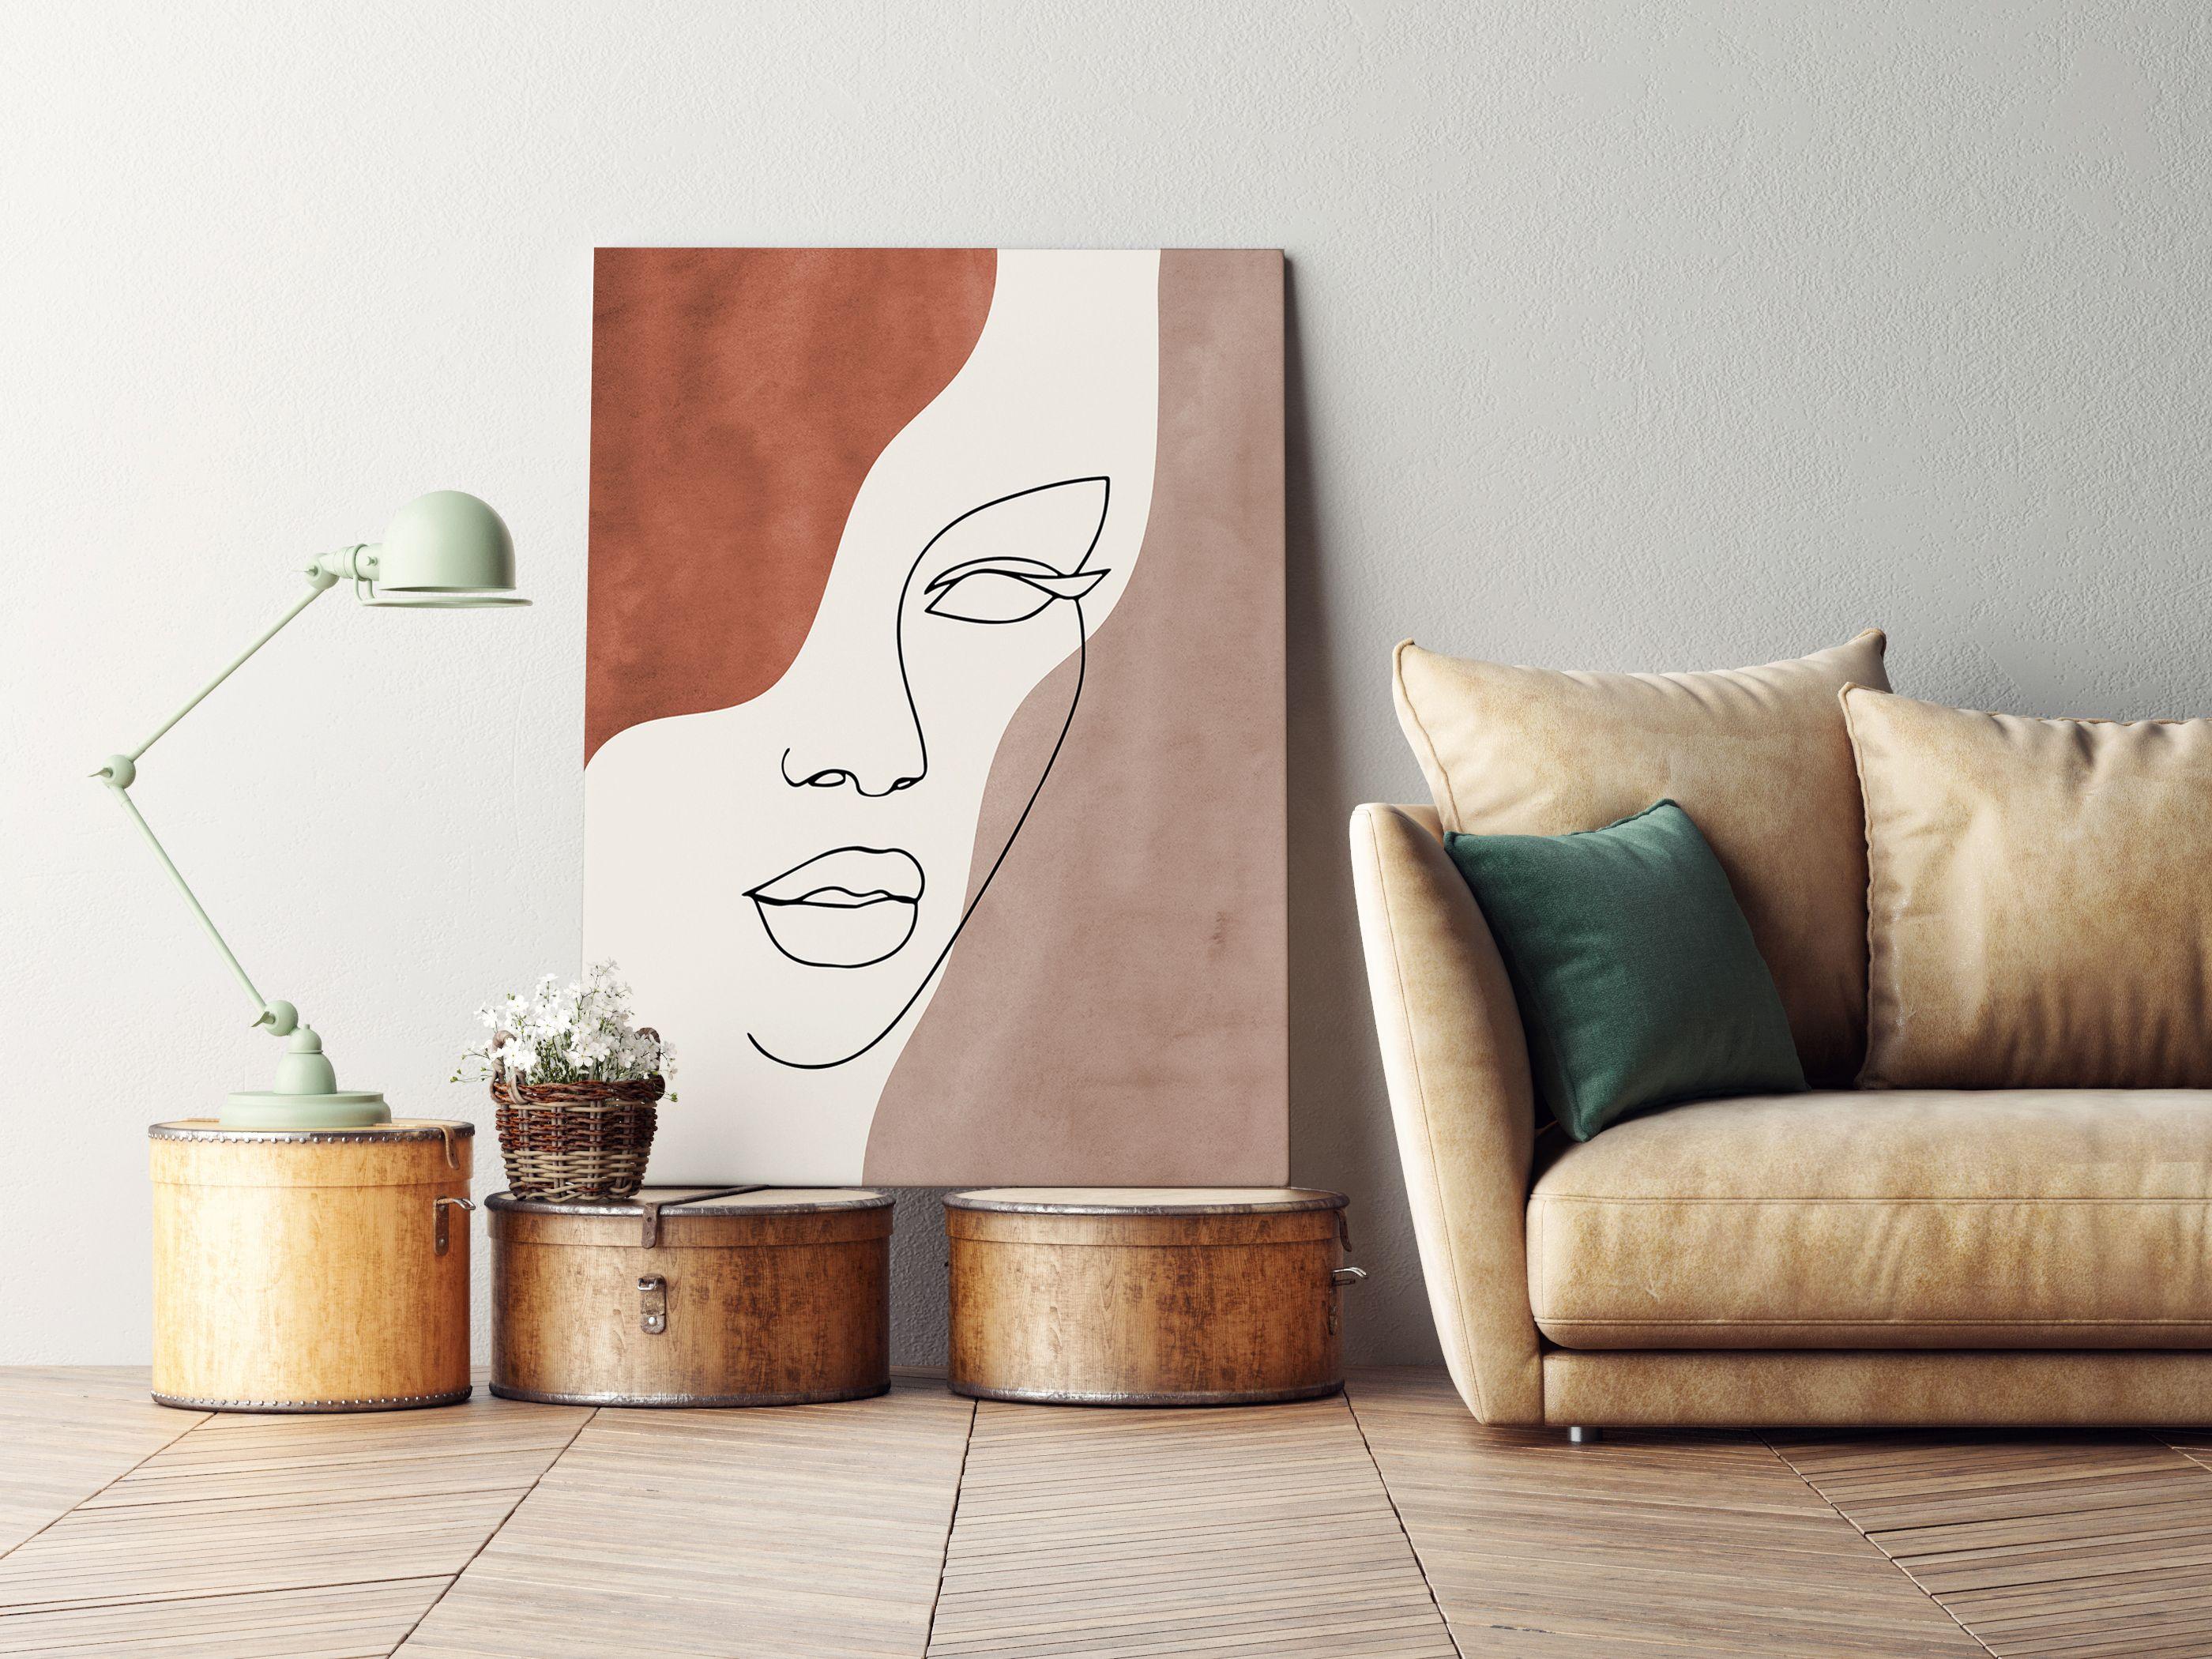 Abstract Face Line Art Print, Line Portrait Earth Tones Minimal Art, Boho Decor